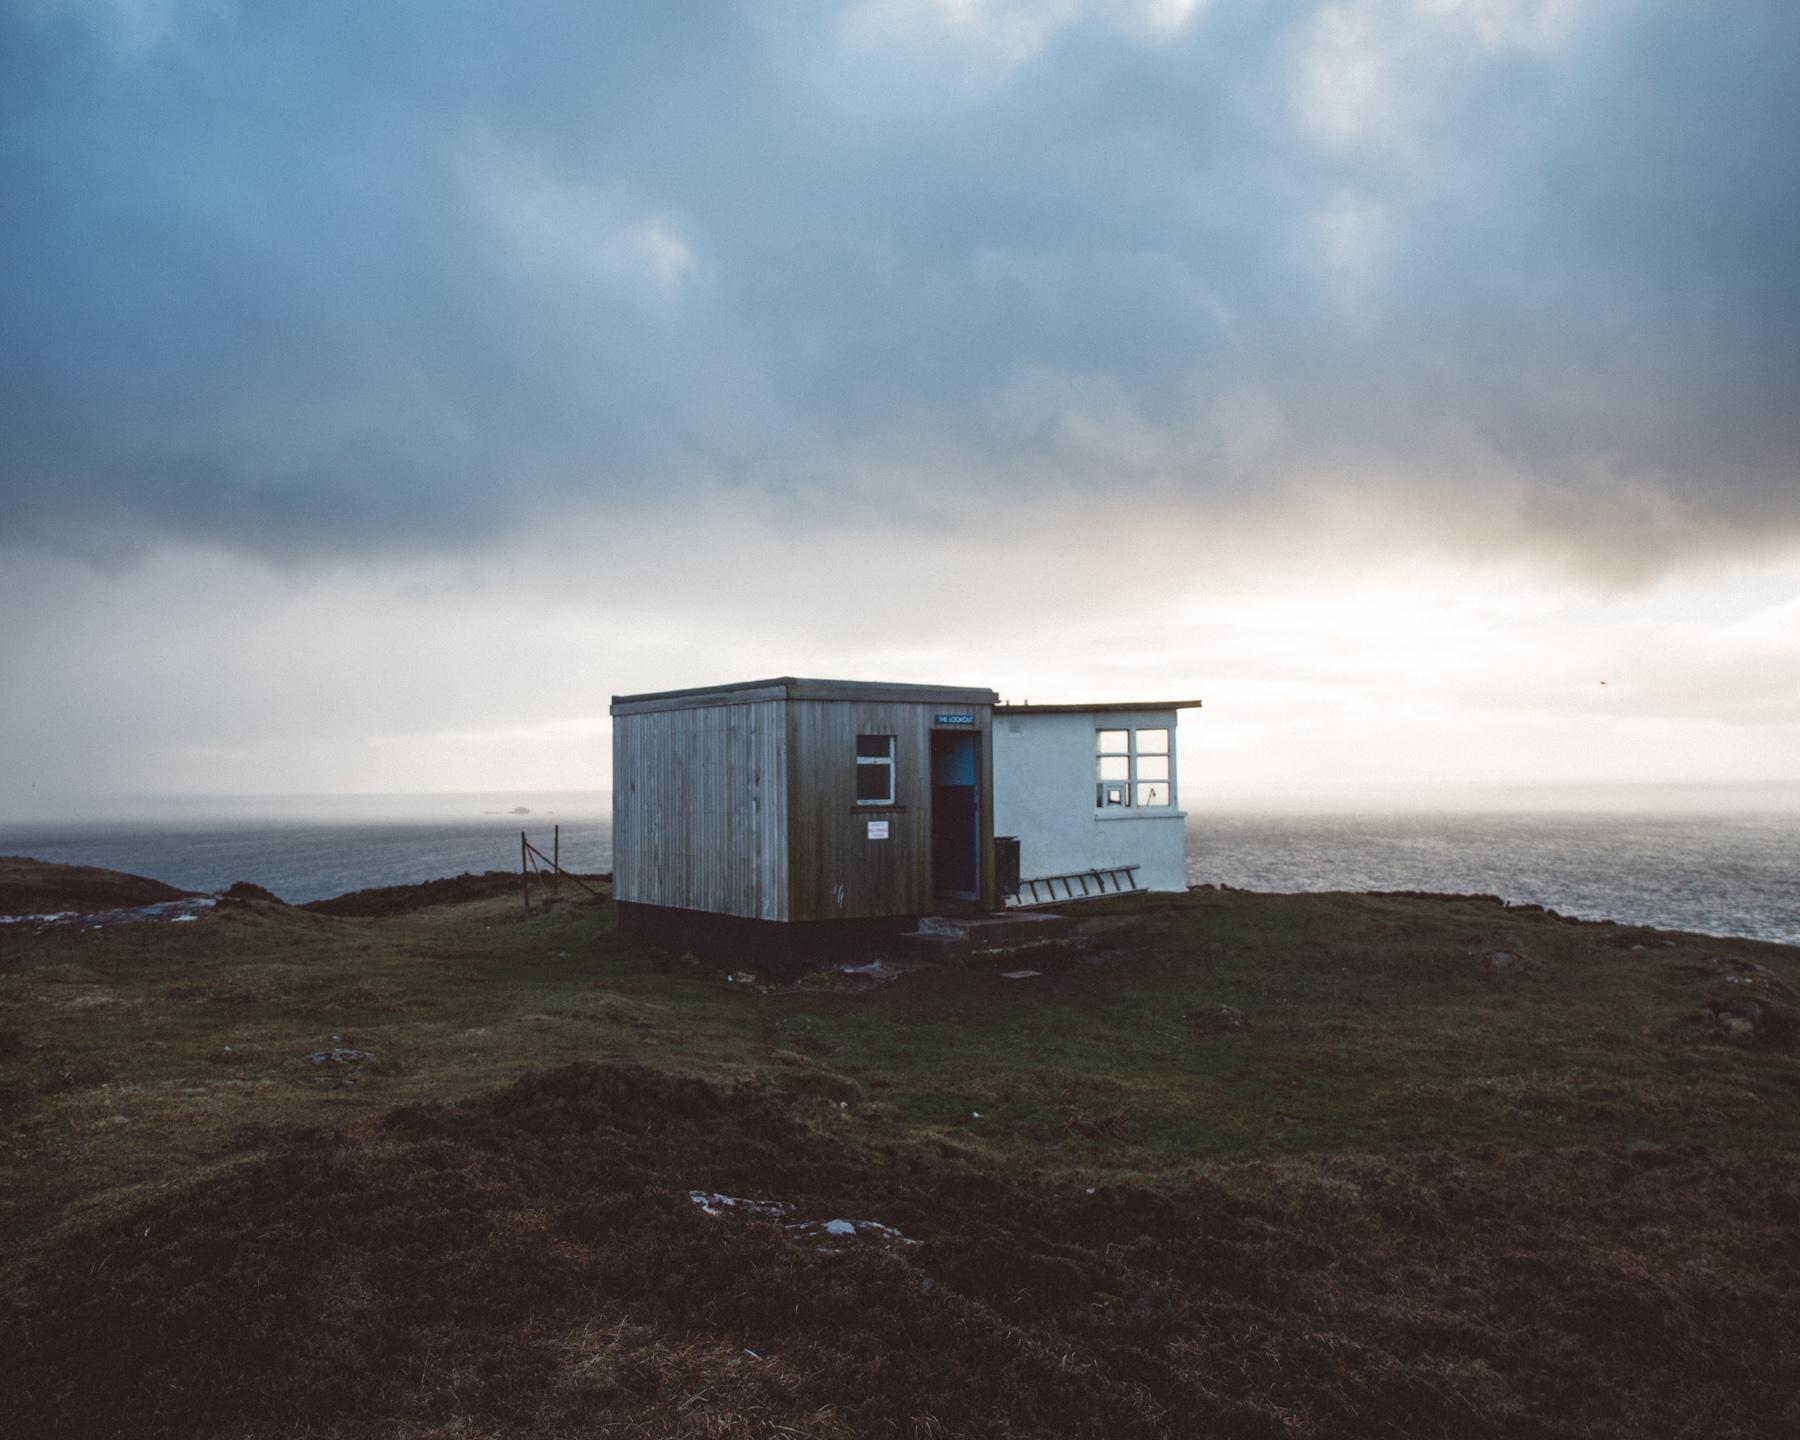 'The Lookout' on the Isle of Skye by Jonas Stuck